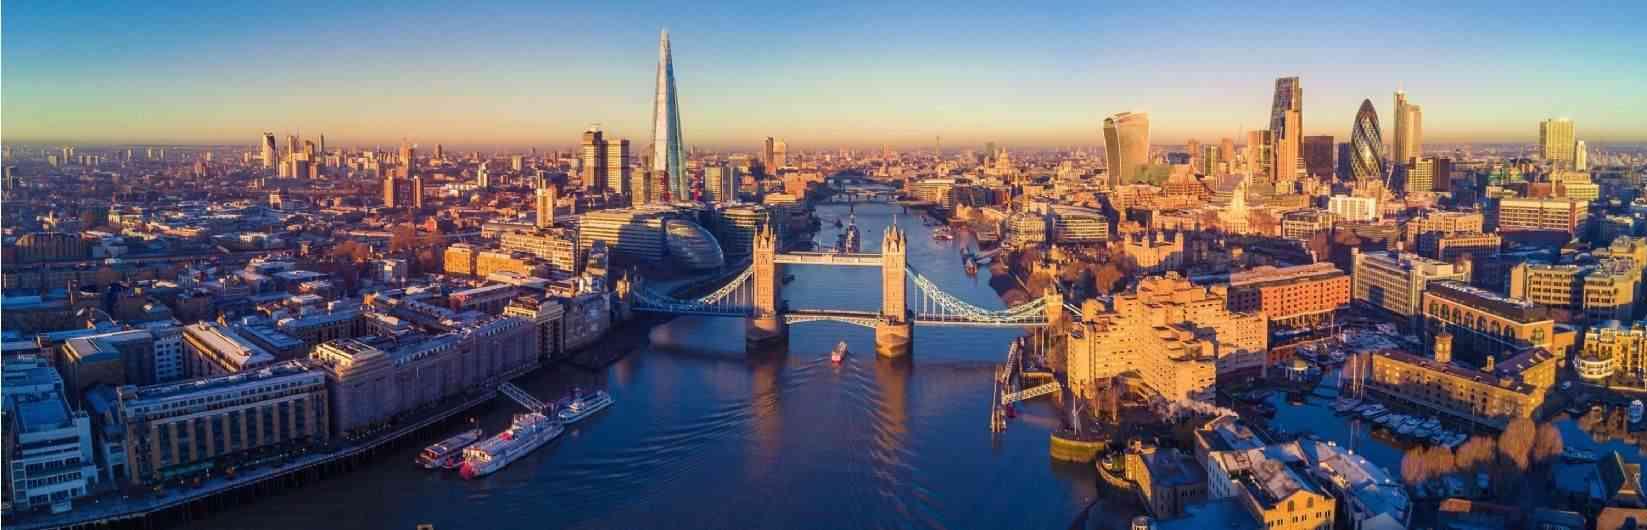 Savills UK | London Property Investment Services